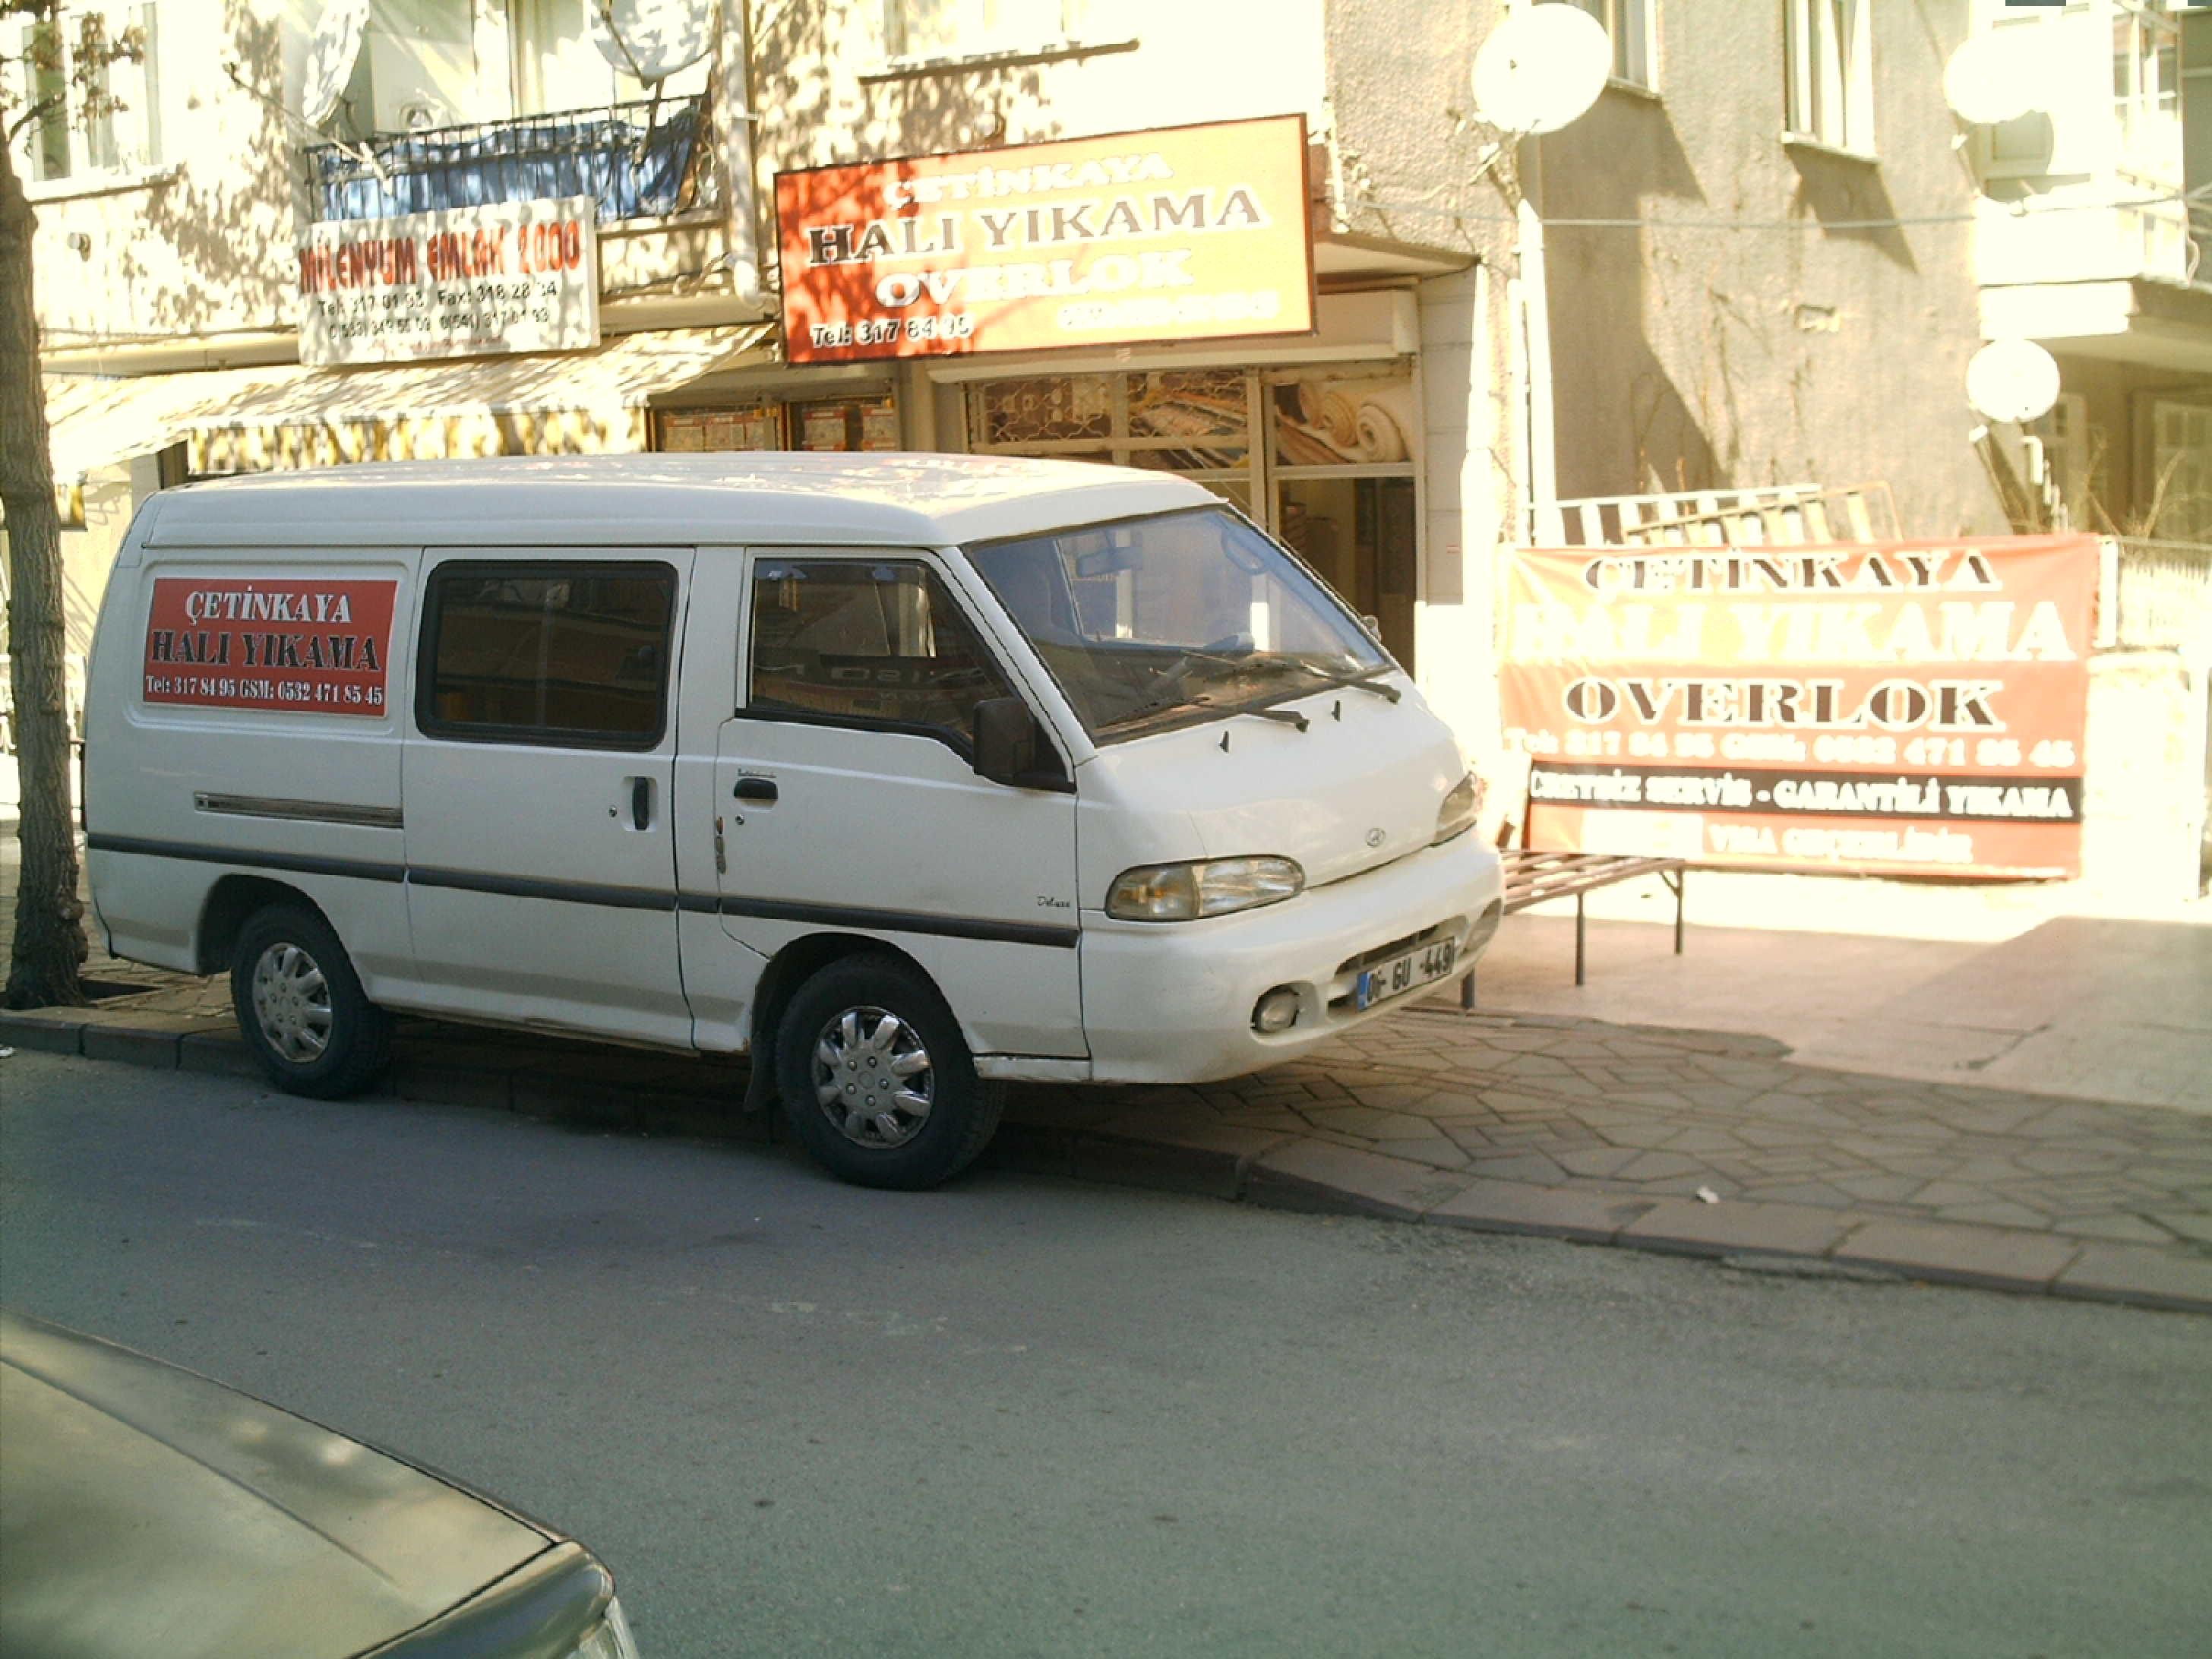 demirlibahce_hali_yikama_servis-1-1